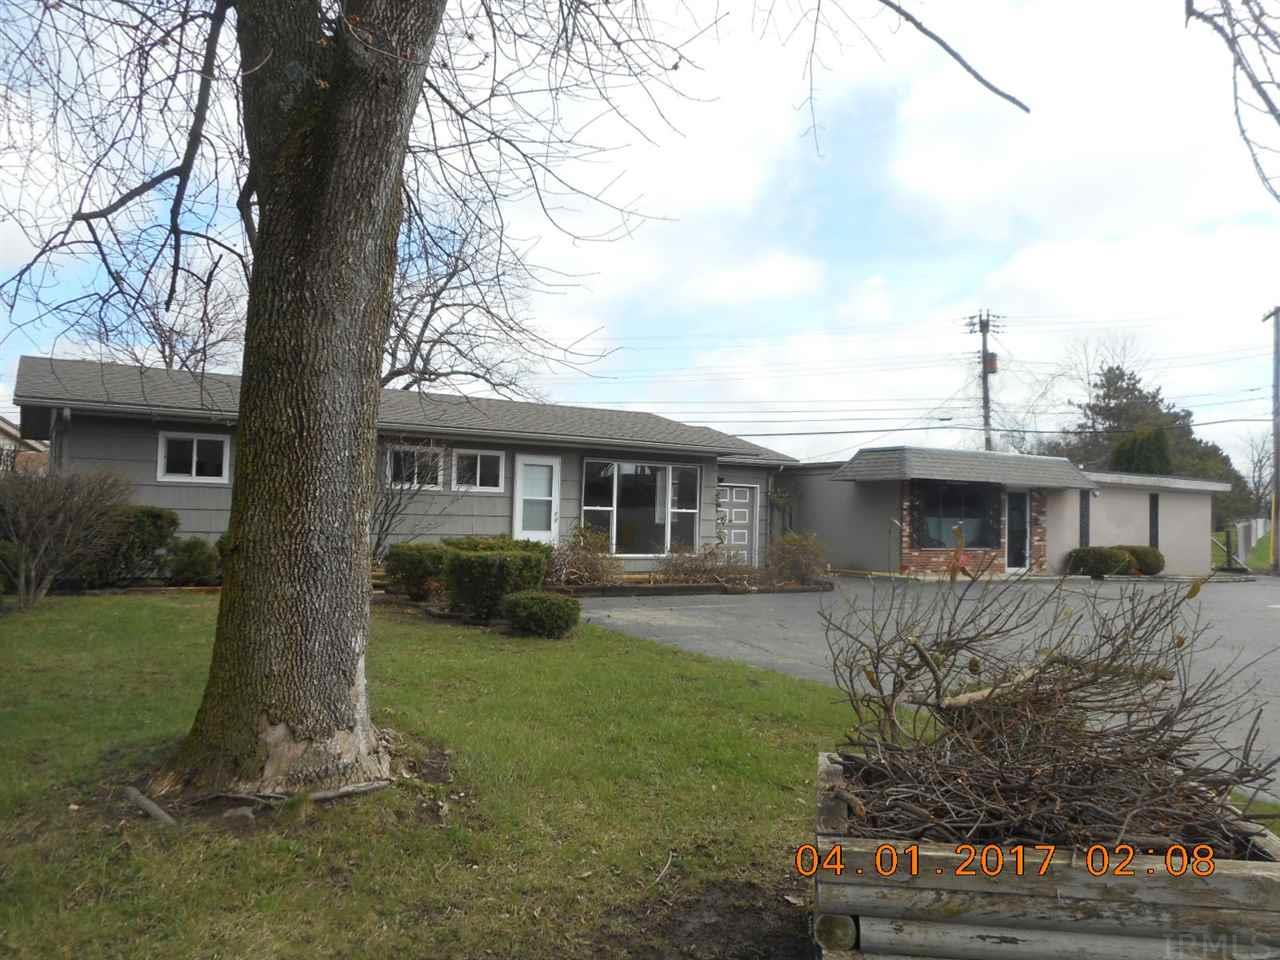 3508-3510 W Westview, Muncie, IN 47304